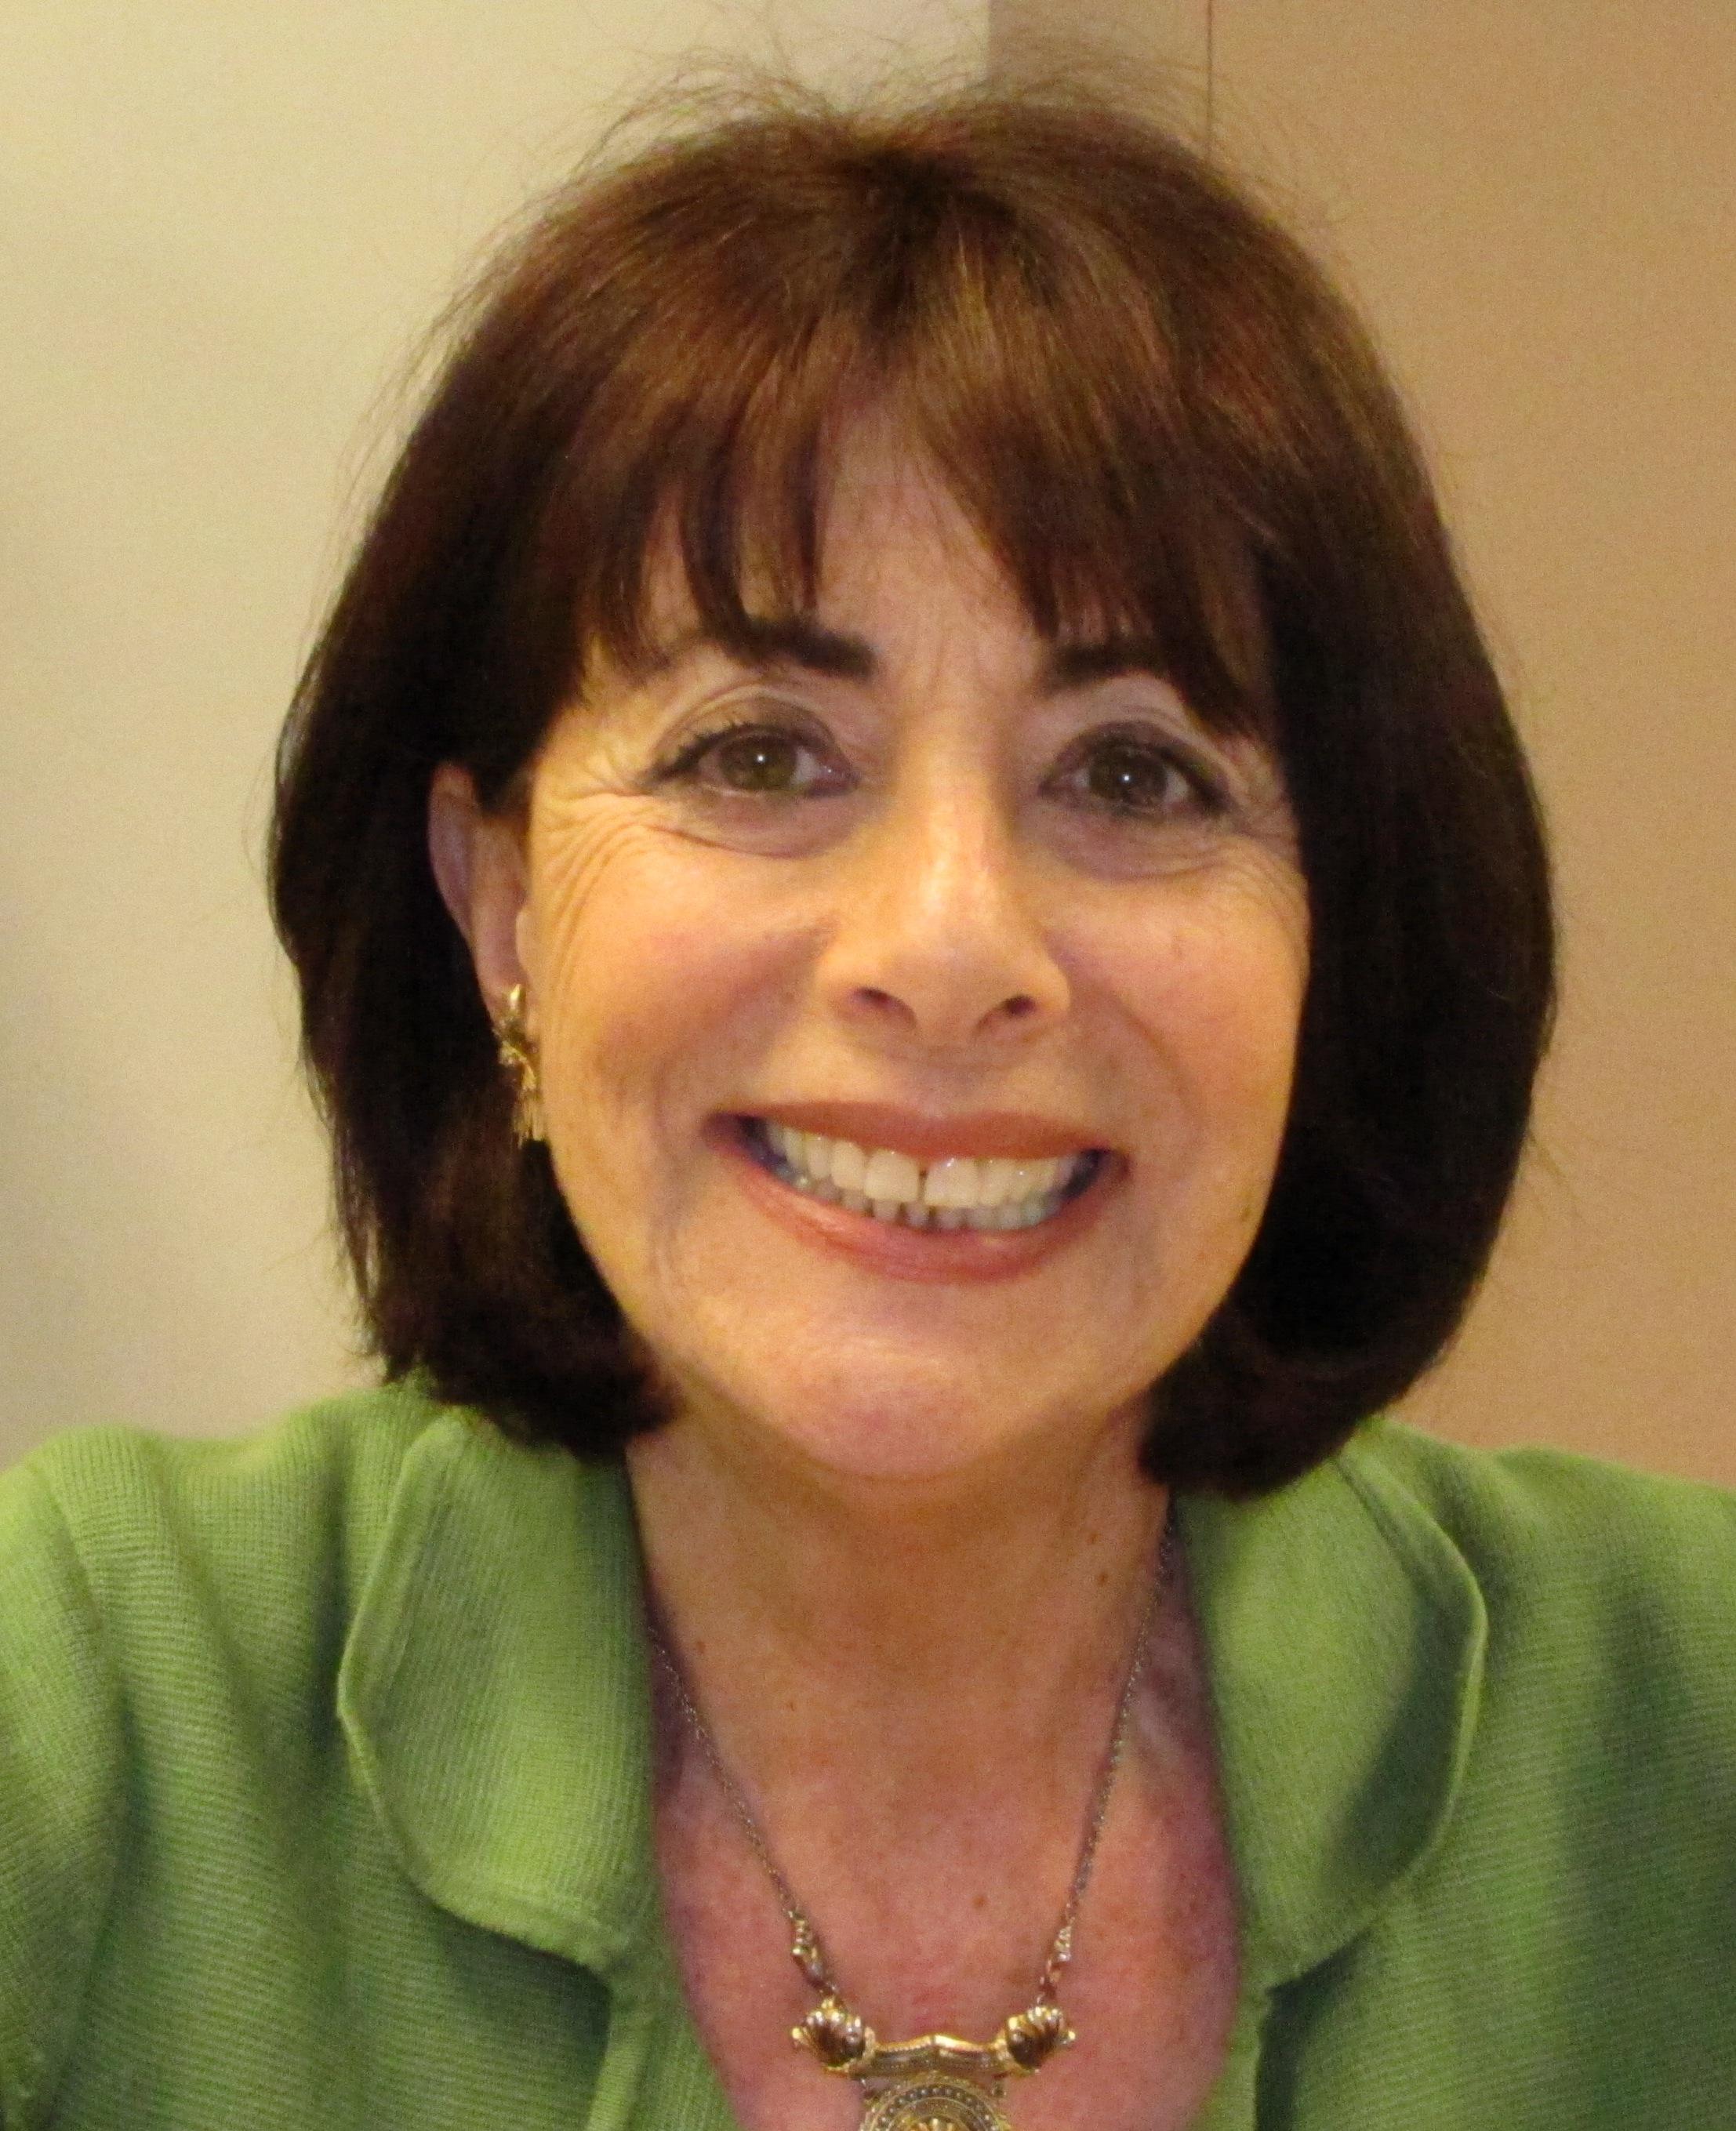 Gail Weisberg